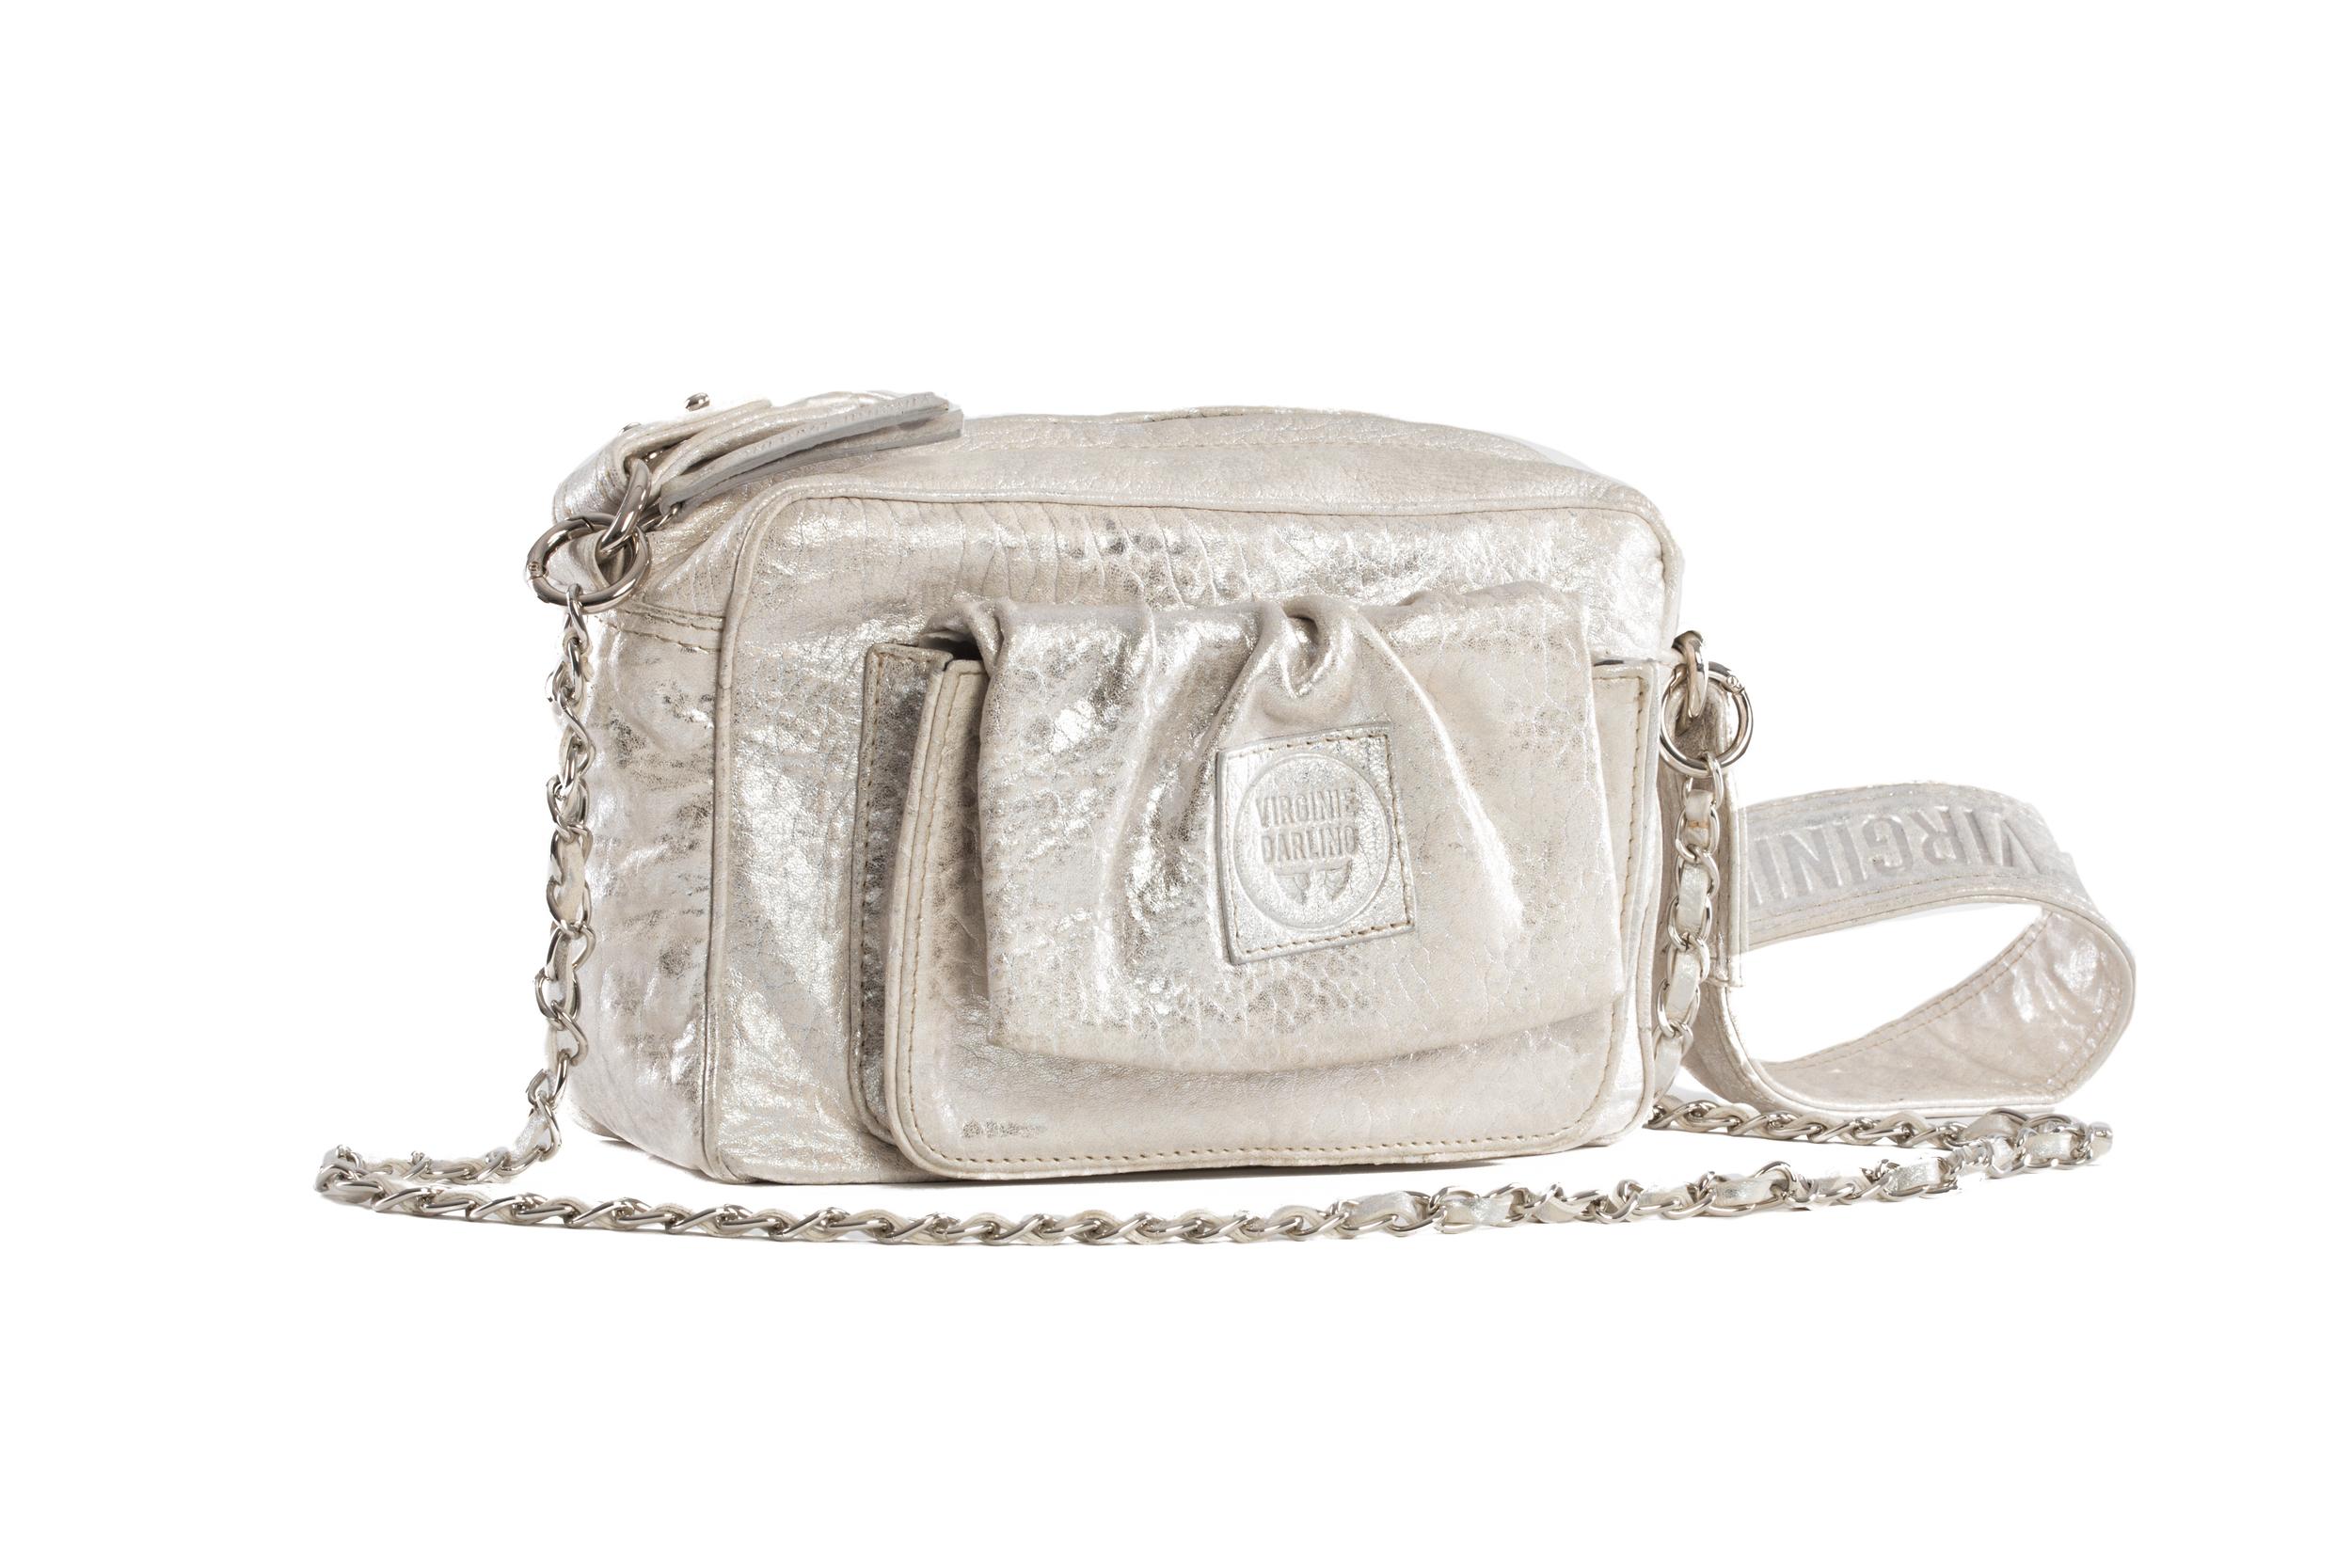 SAC CAMERA LOVE BUBBLE WHITE ARGENT - Nouvelle collection